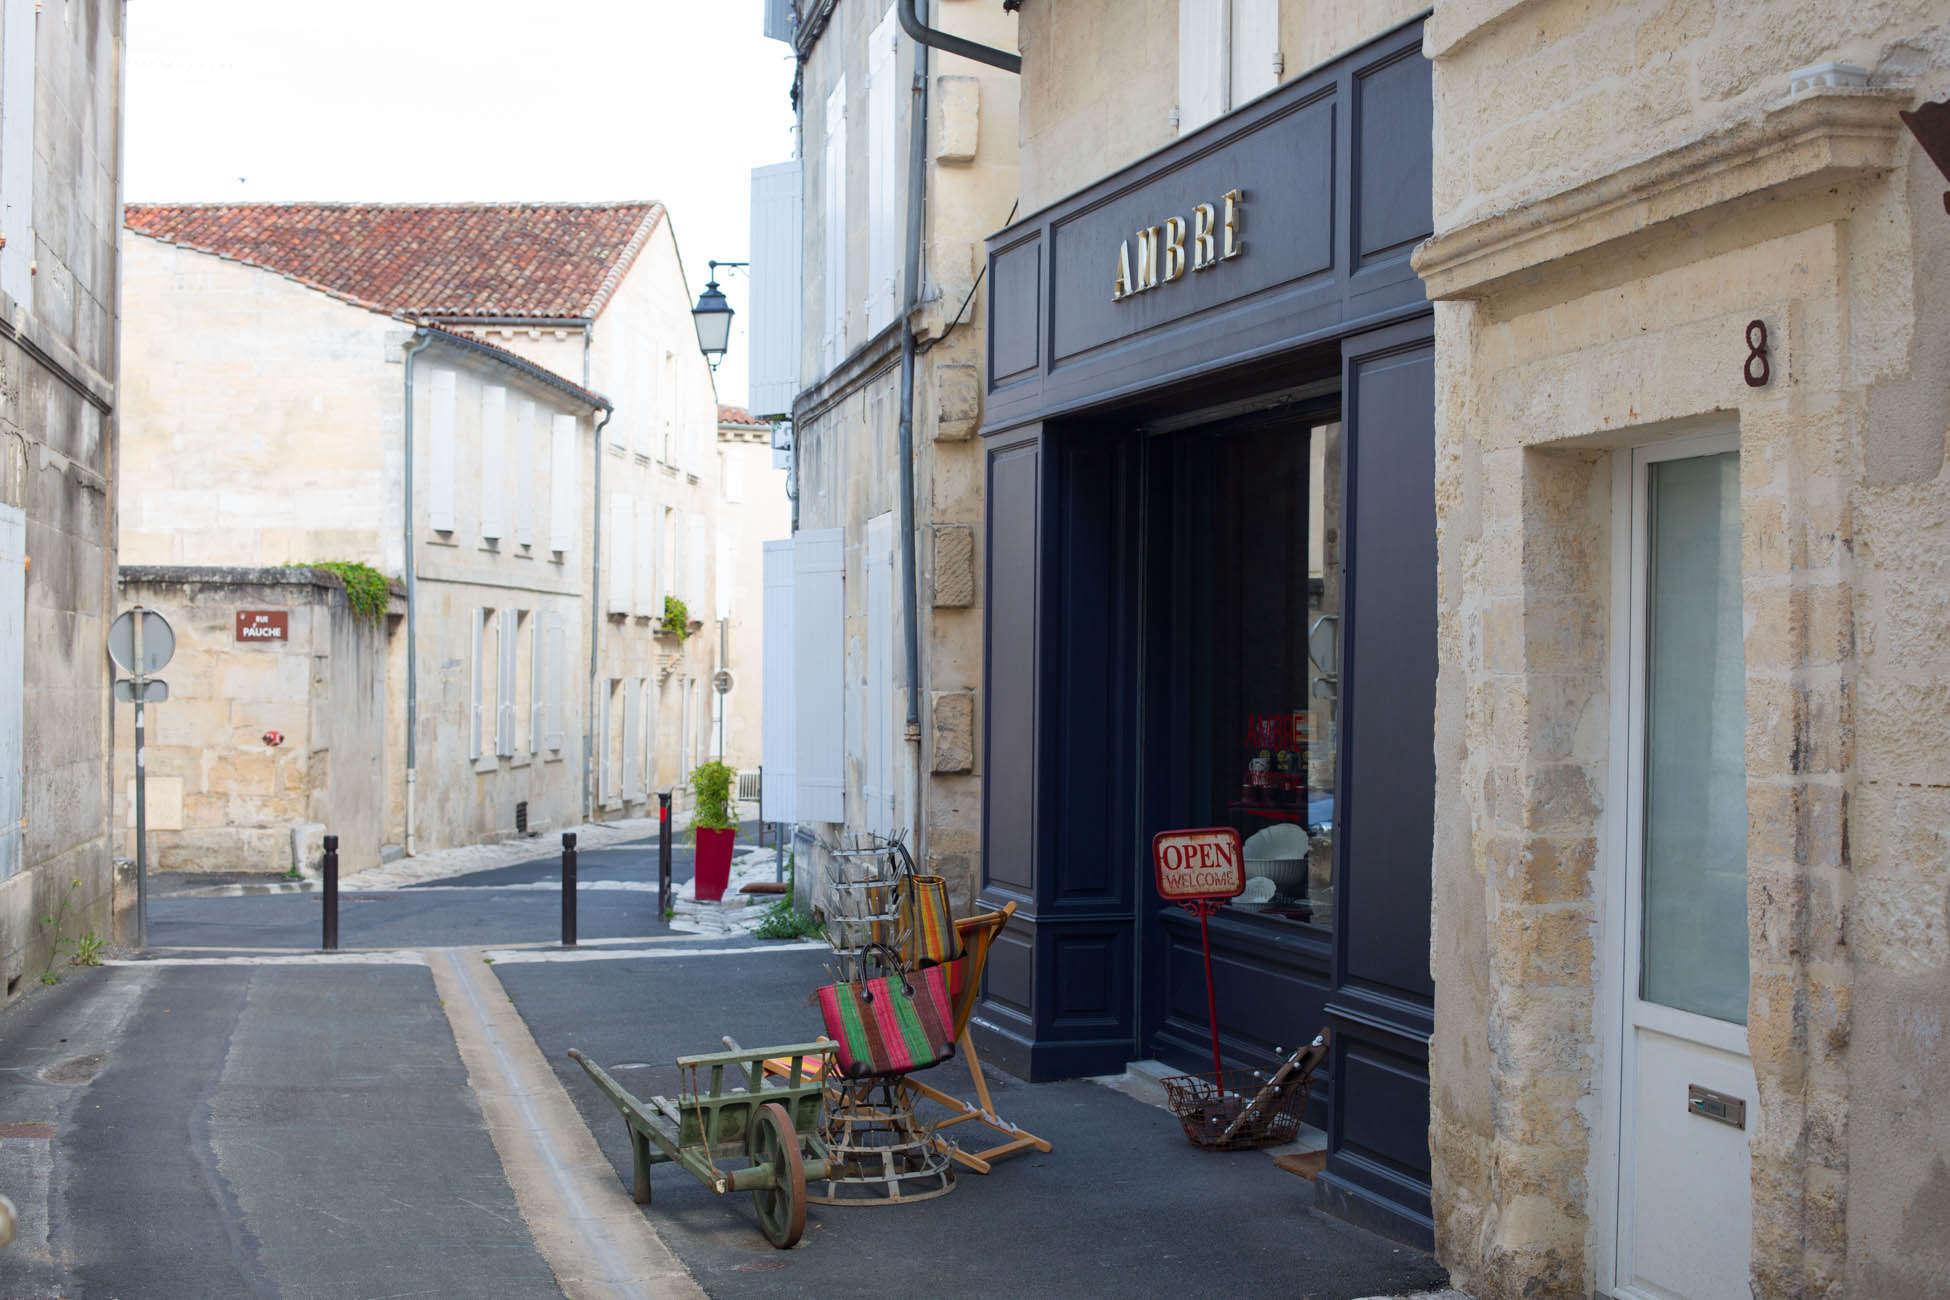 Ambre-store-france-mimi-giboin-gardenista-071-2